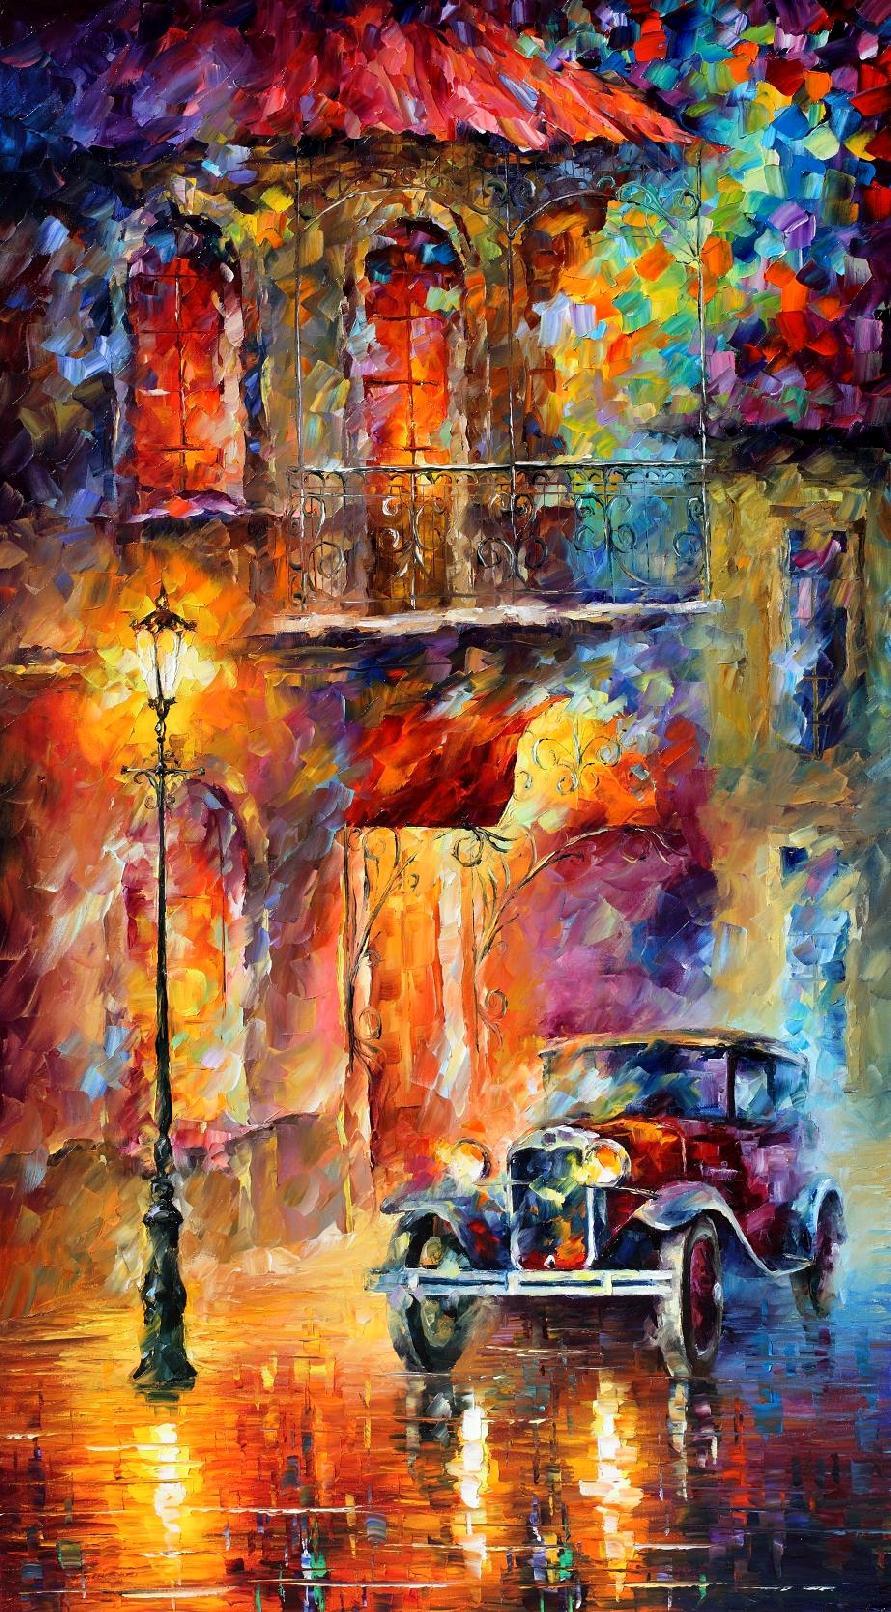 Old Car by Leonid Afremov